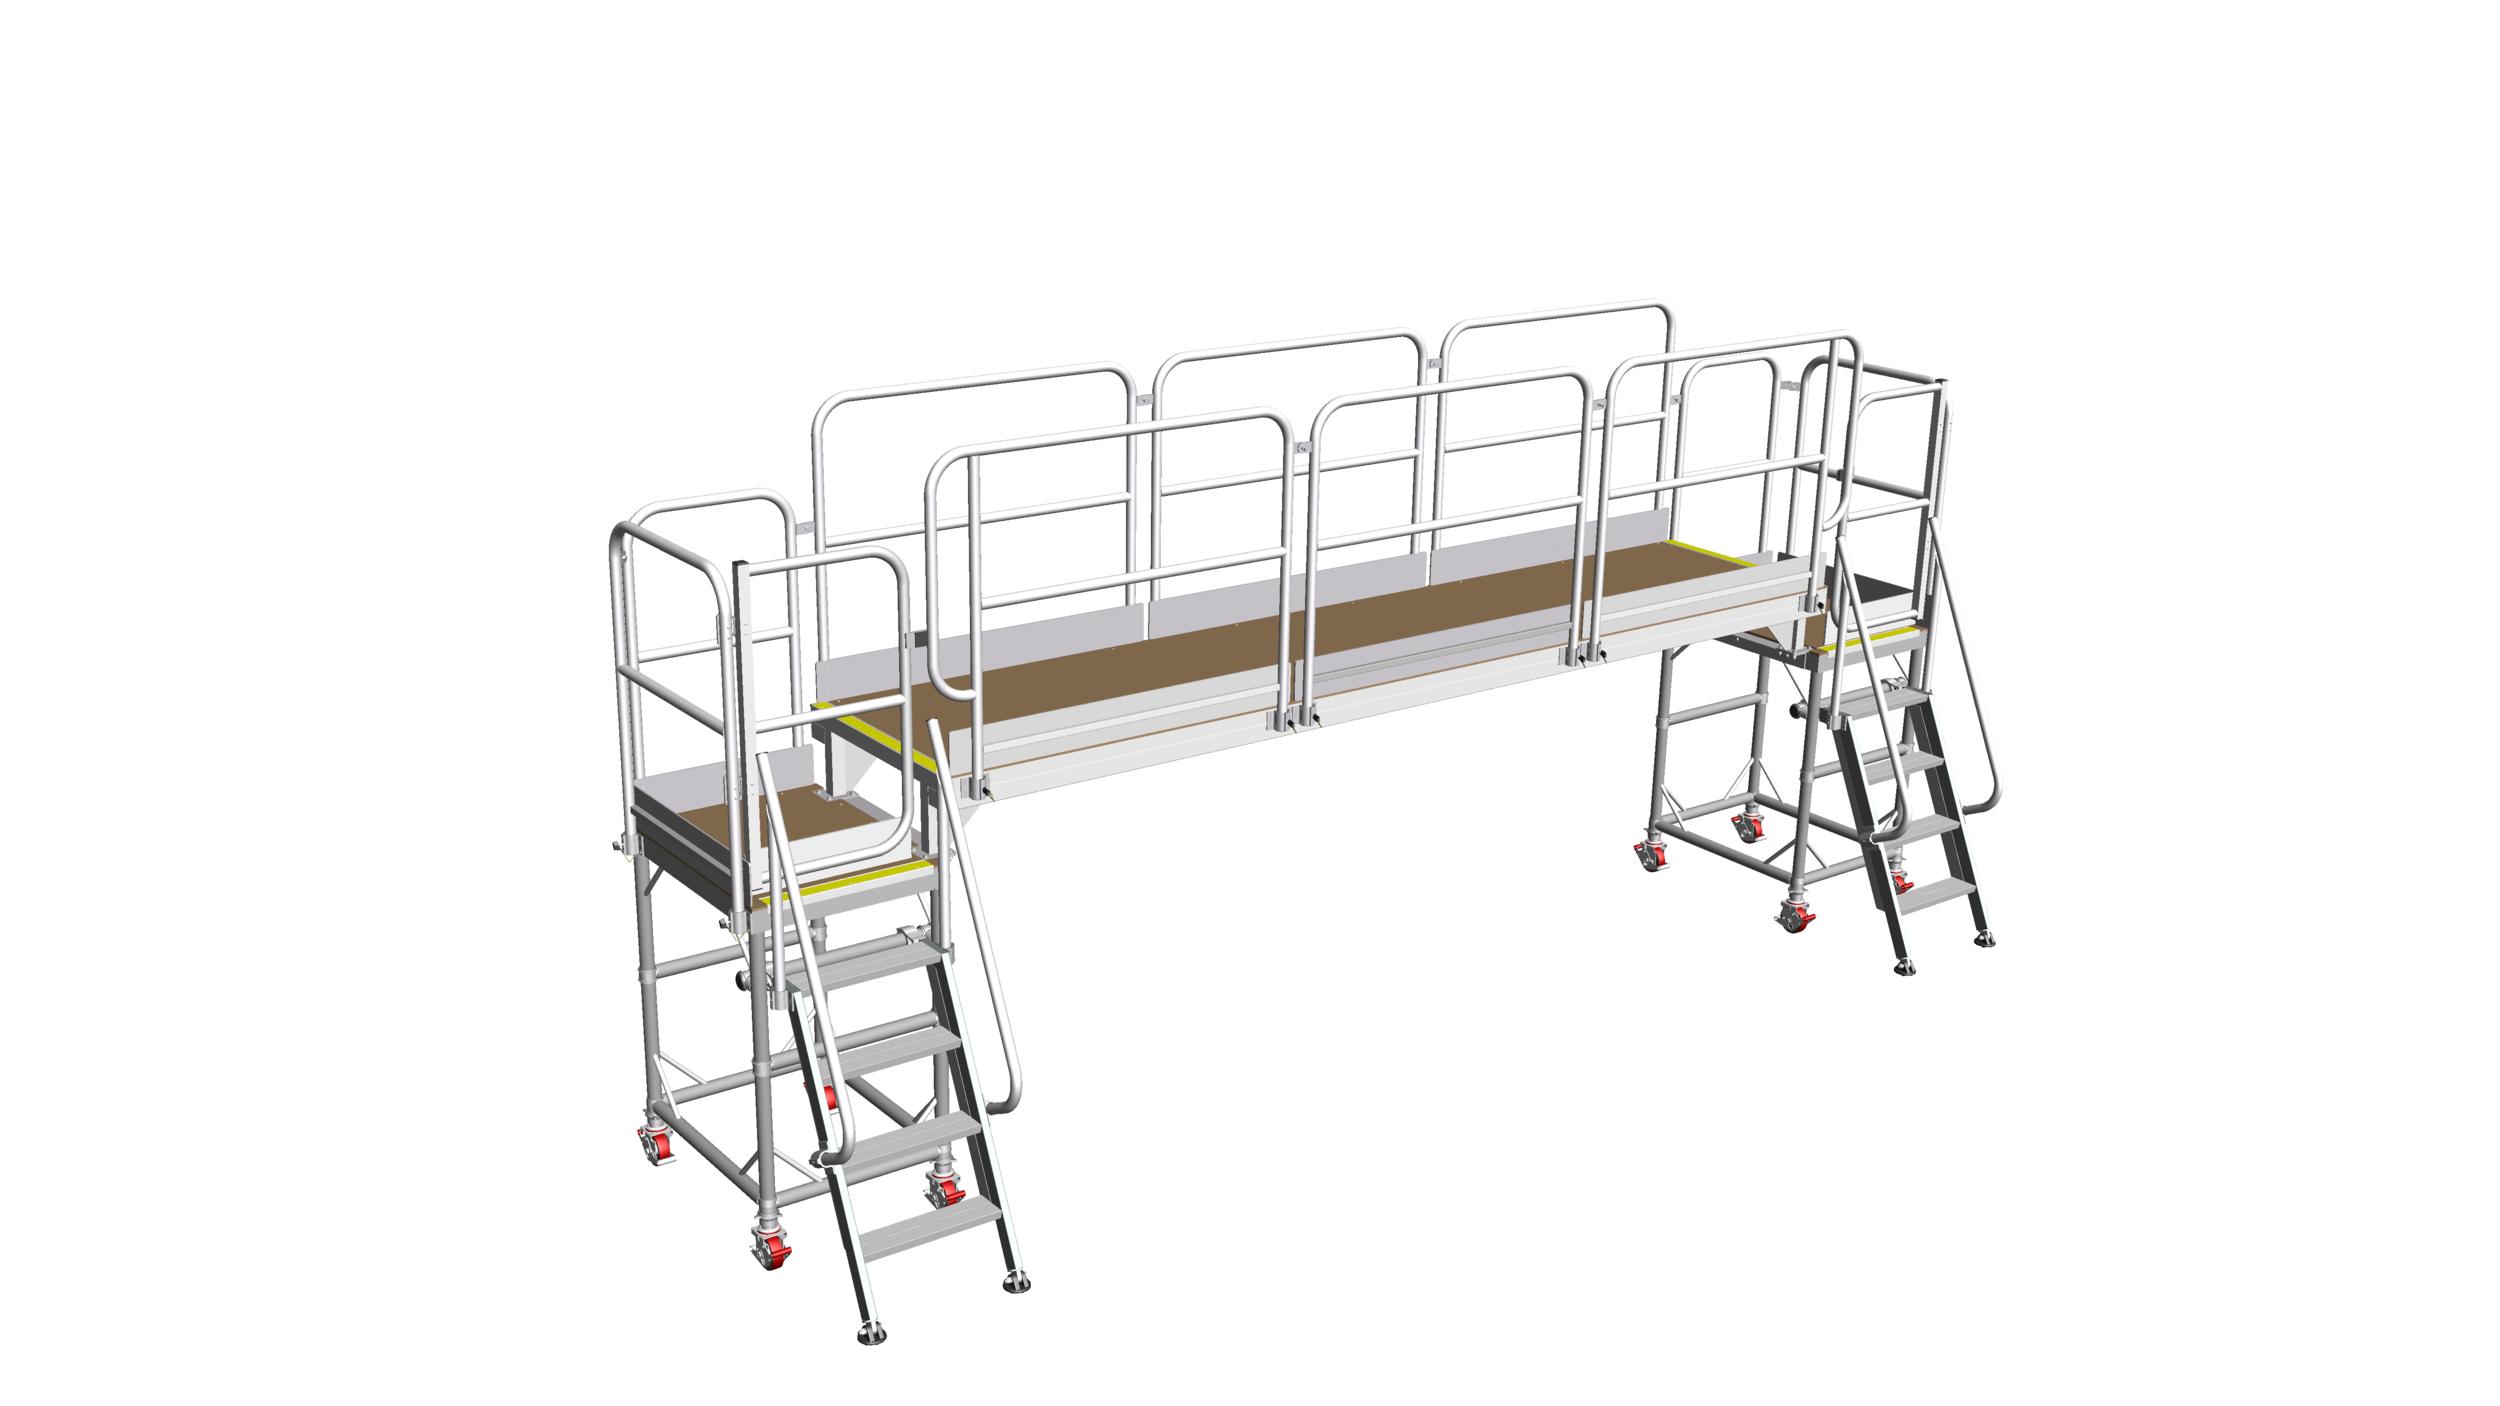 32. Door installation platform